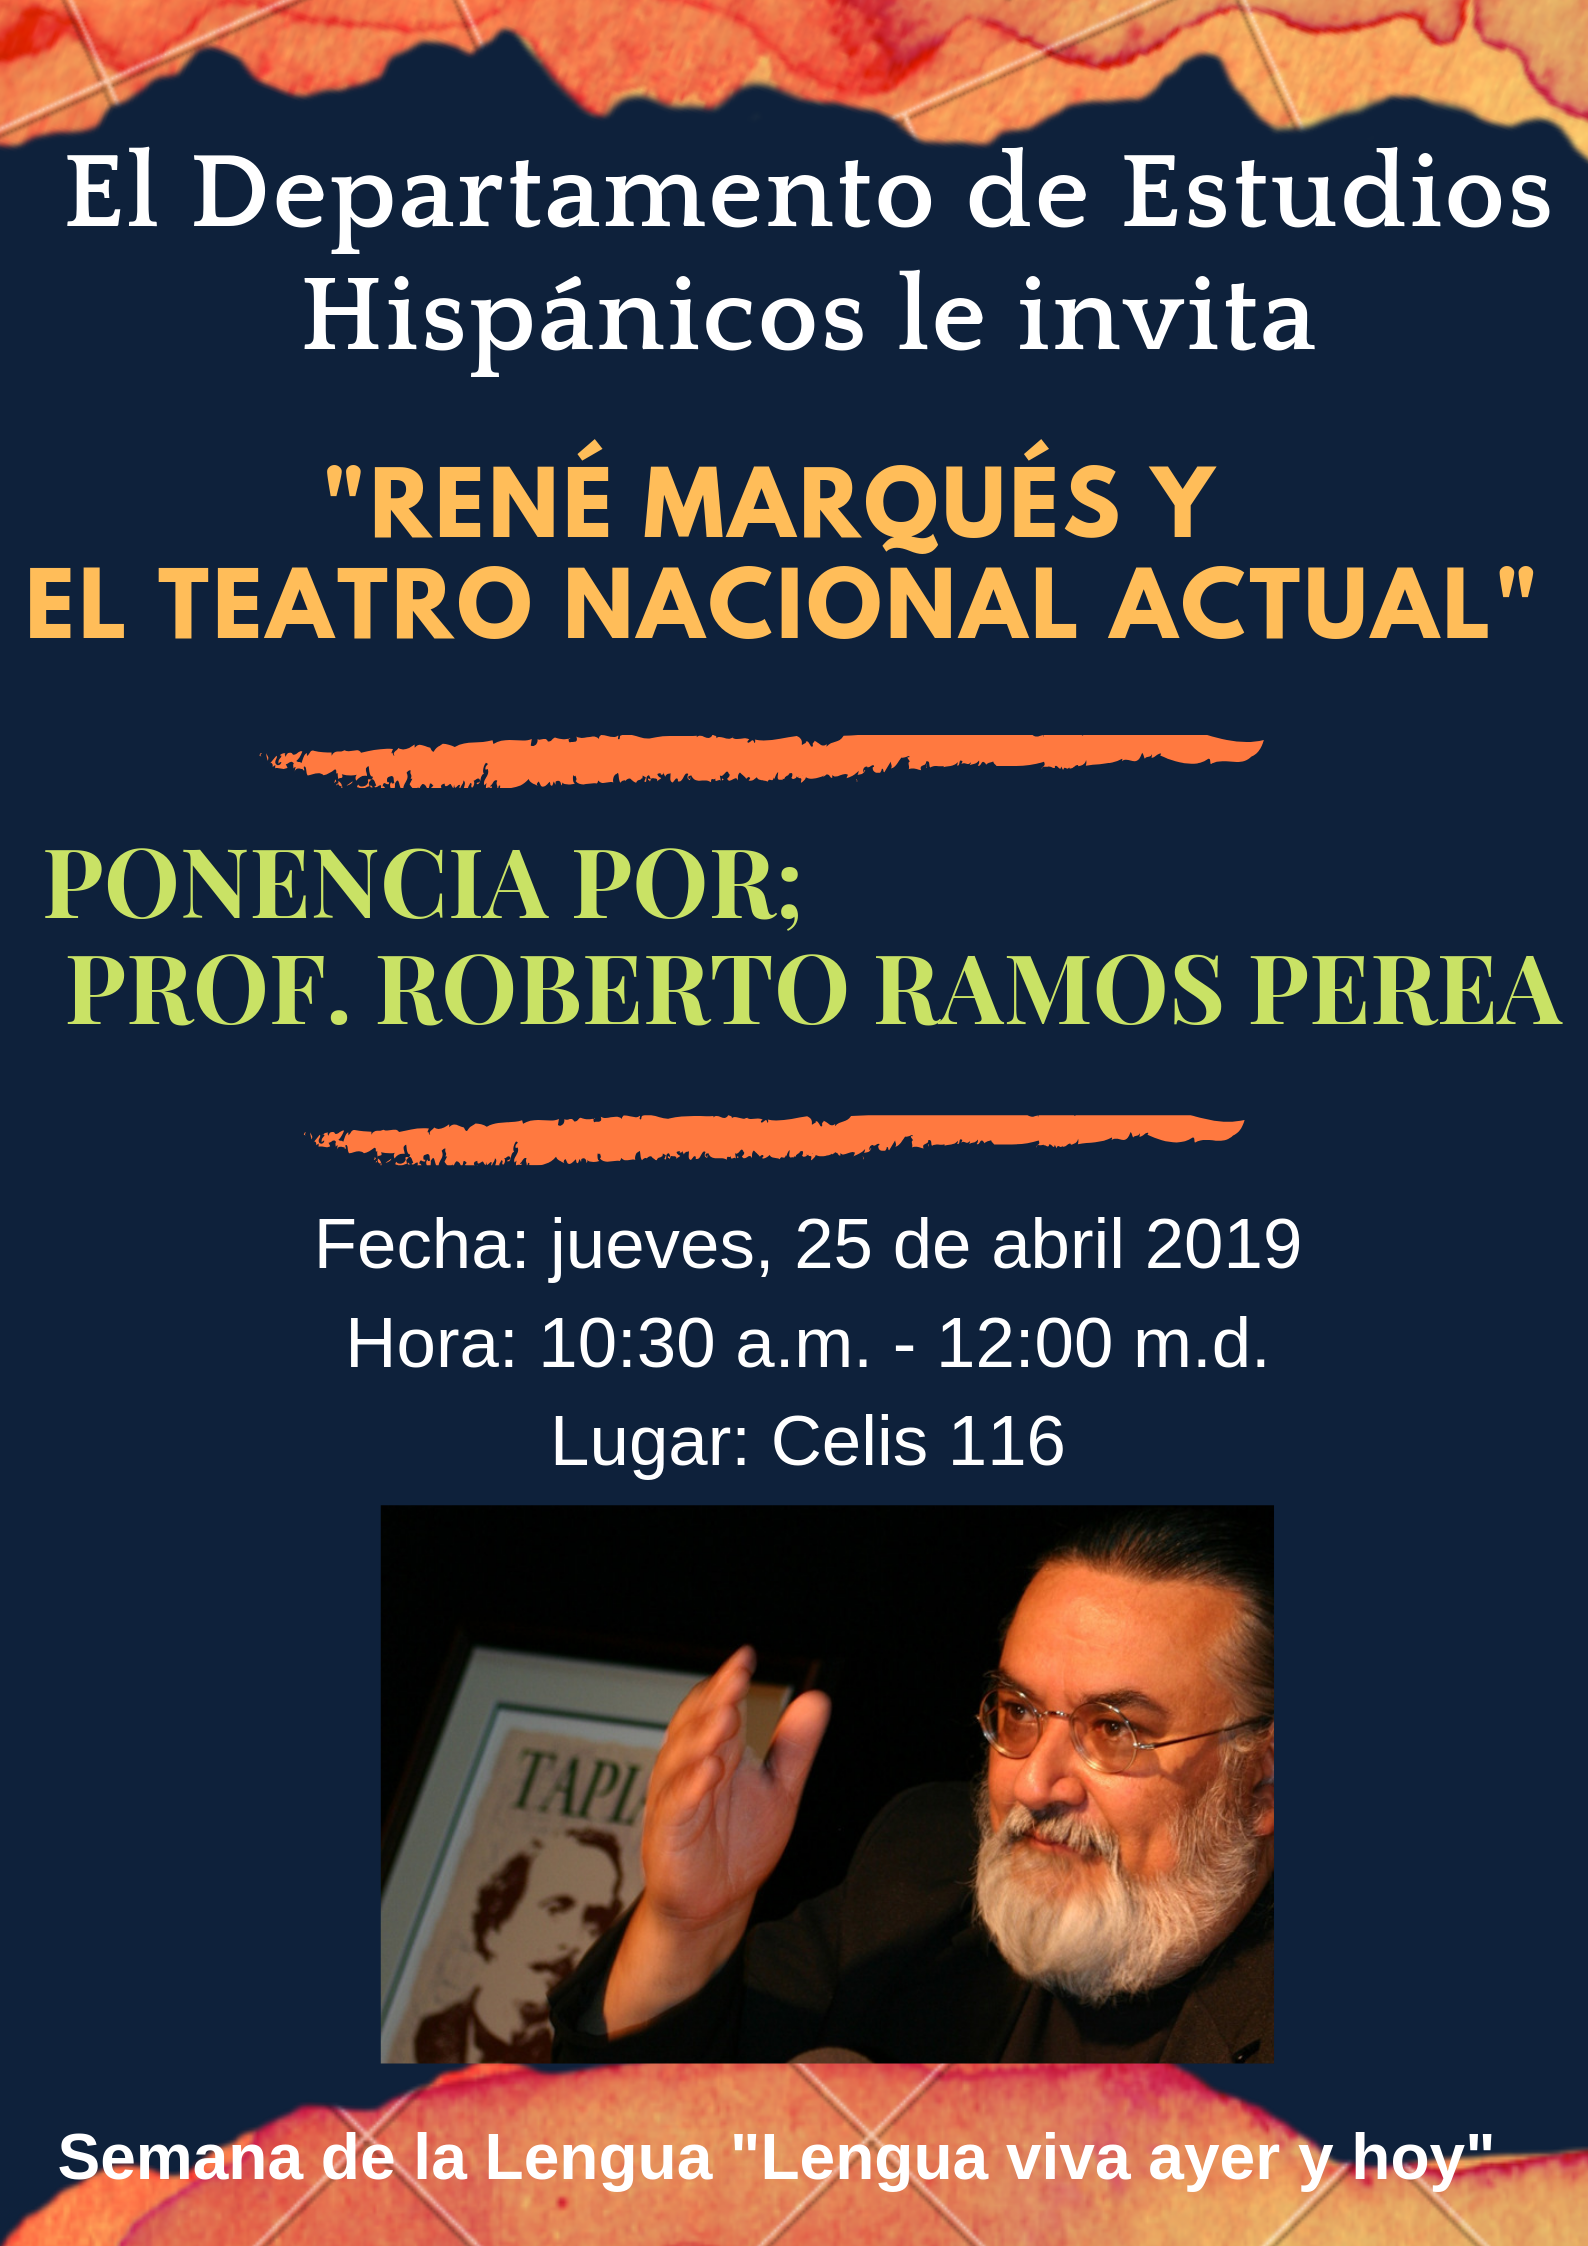 Pomo Prof. Roberto Ramos Perea